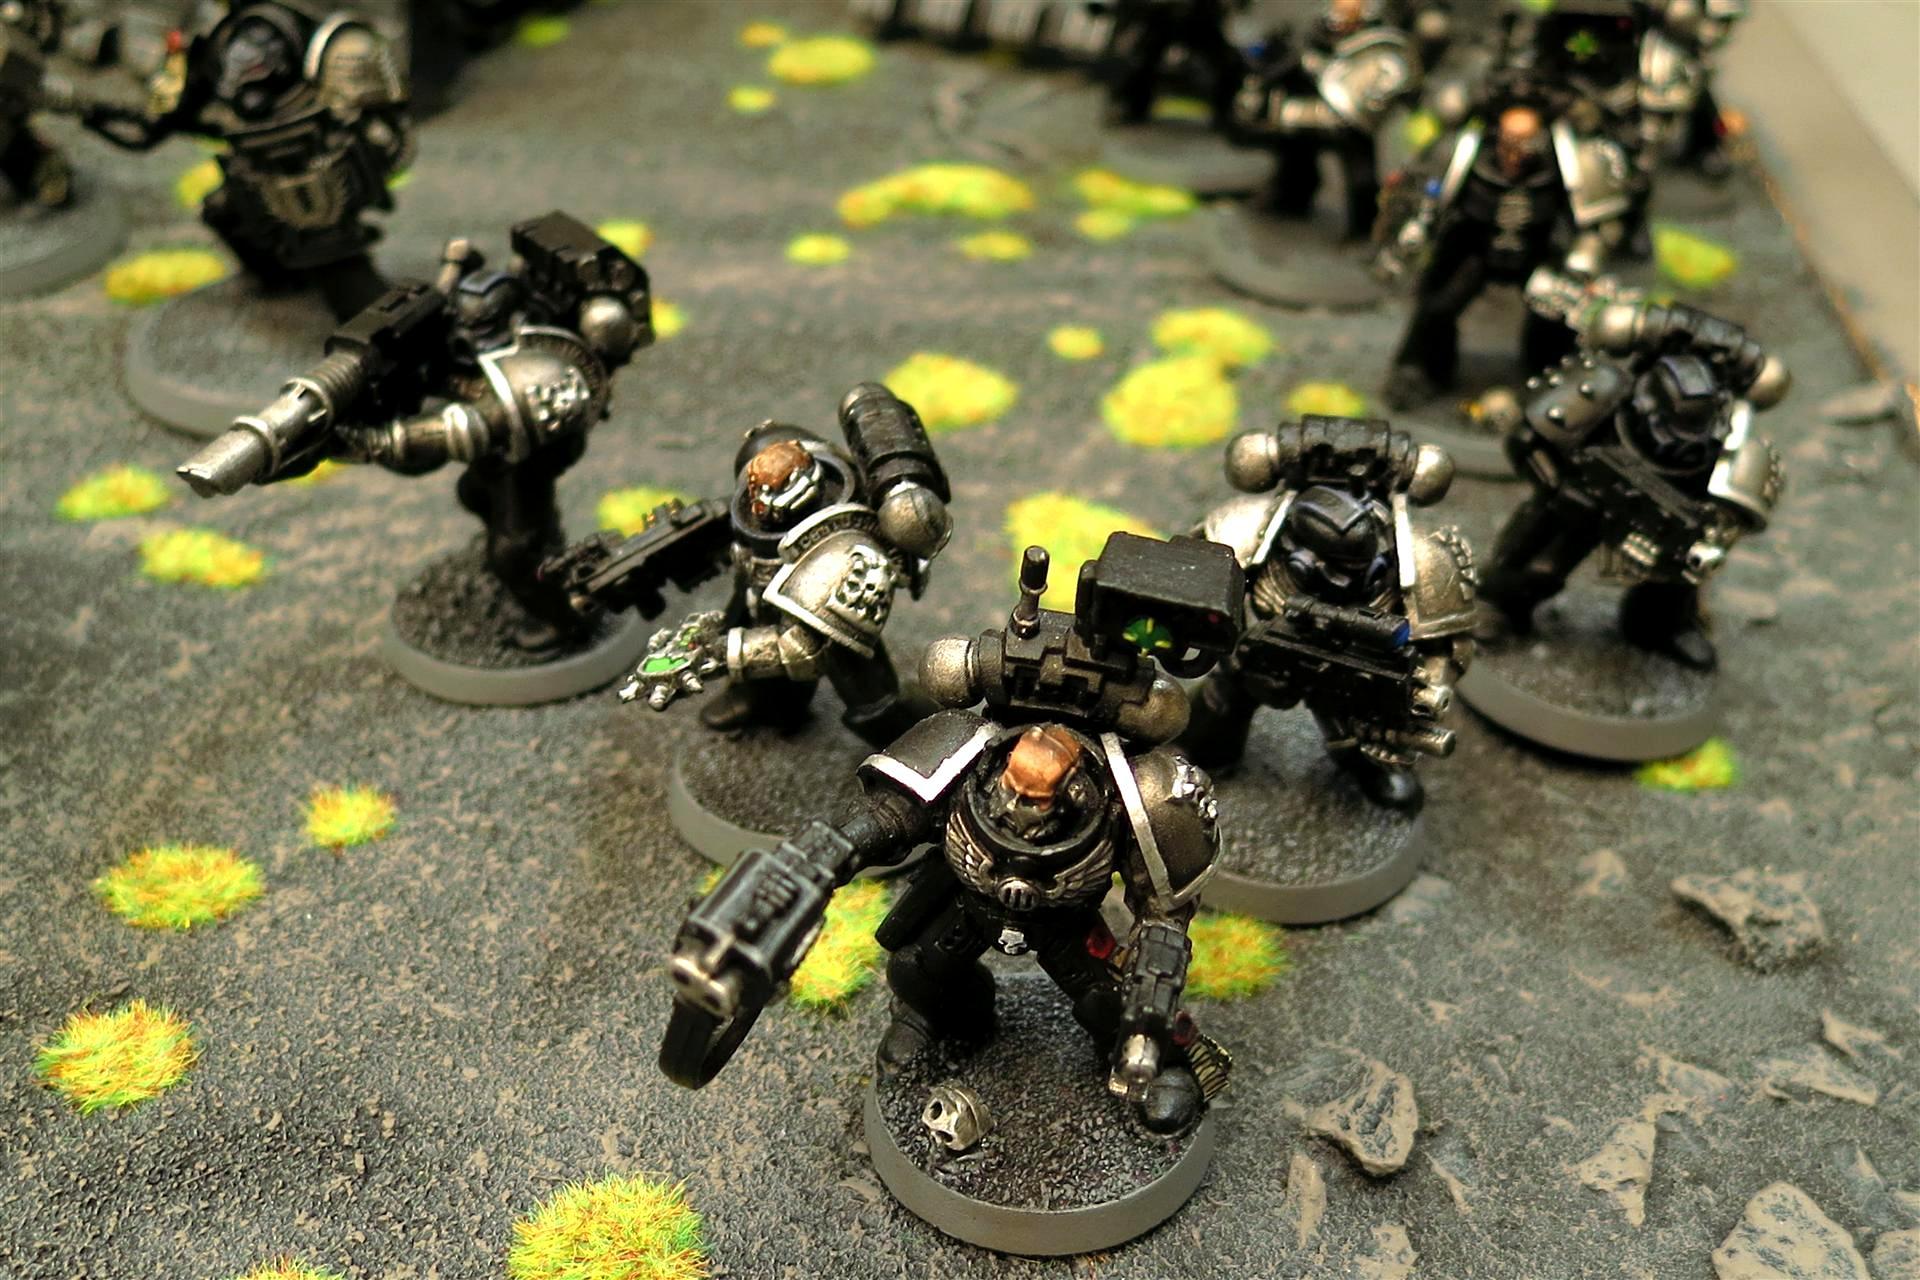 Alien Hunters, Auspex, Black Shields, Combat Squad, Deathwatch, Deathwatch Killteam, Inquisition, Lascannon, Ordos Xenos, Storm Bolter, Stormbolter